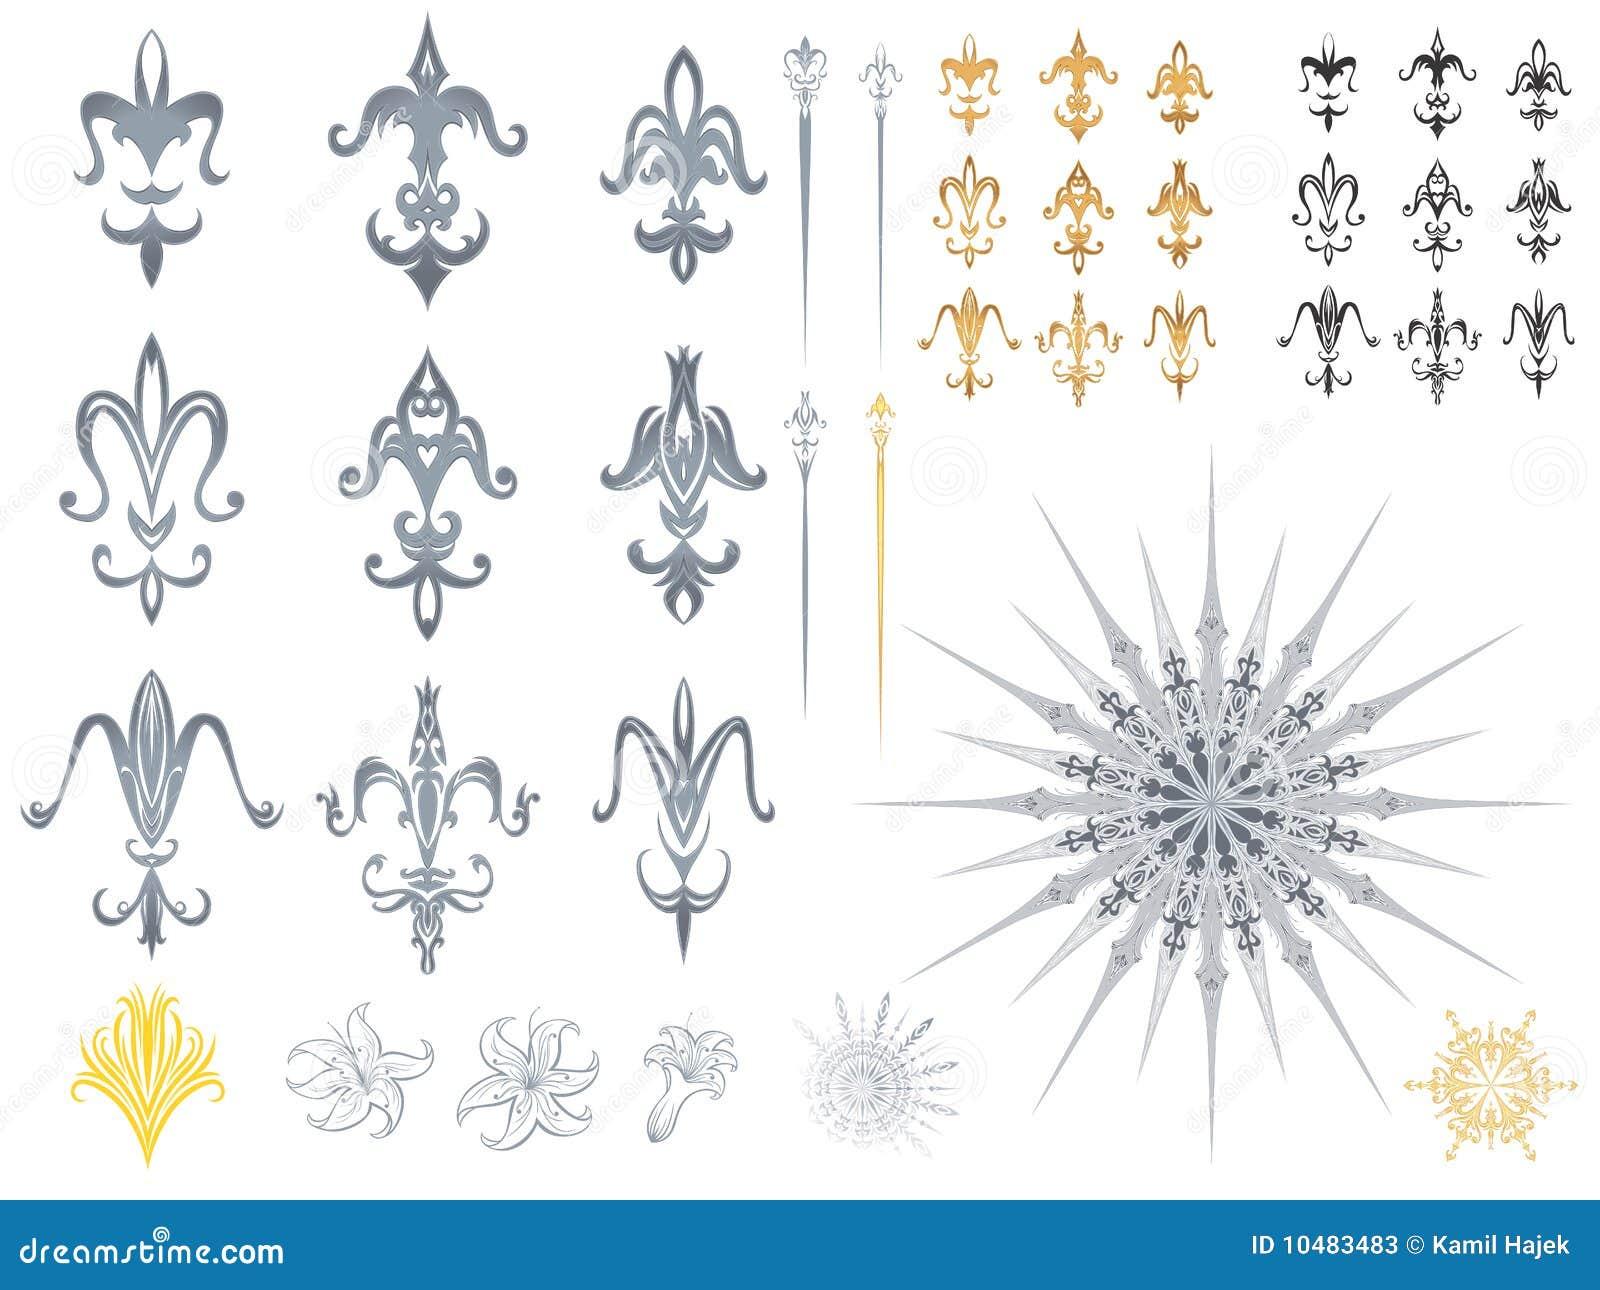 fleur de lis designs stock photos image 10483483. Black Bedroom Furniture Sets. Home Design Ideas